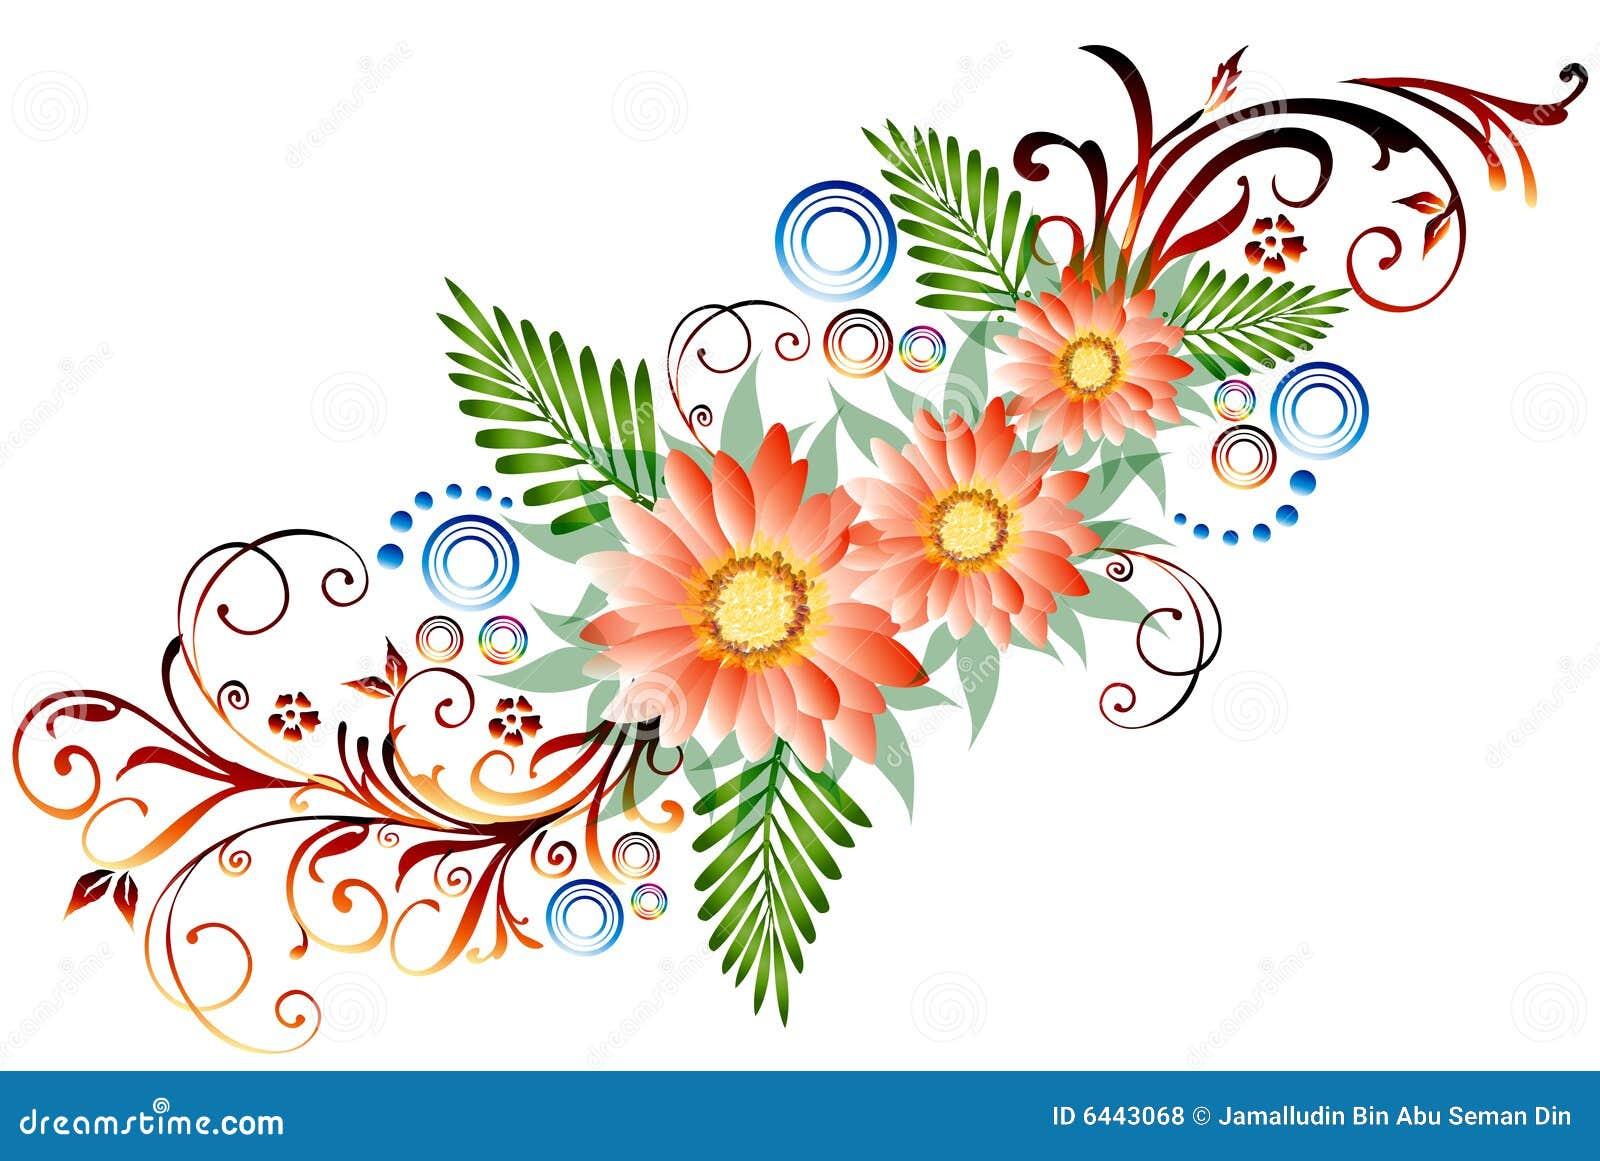 Floral Border Royalty Free Stock Photos Image 6443068